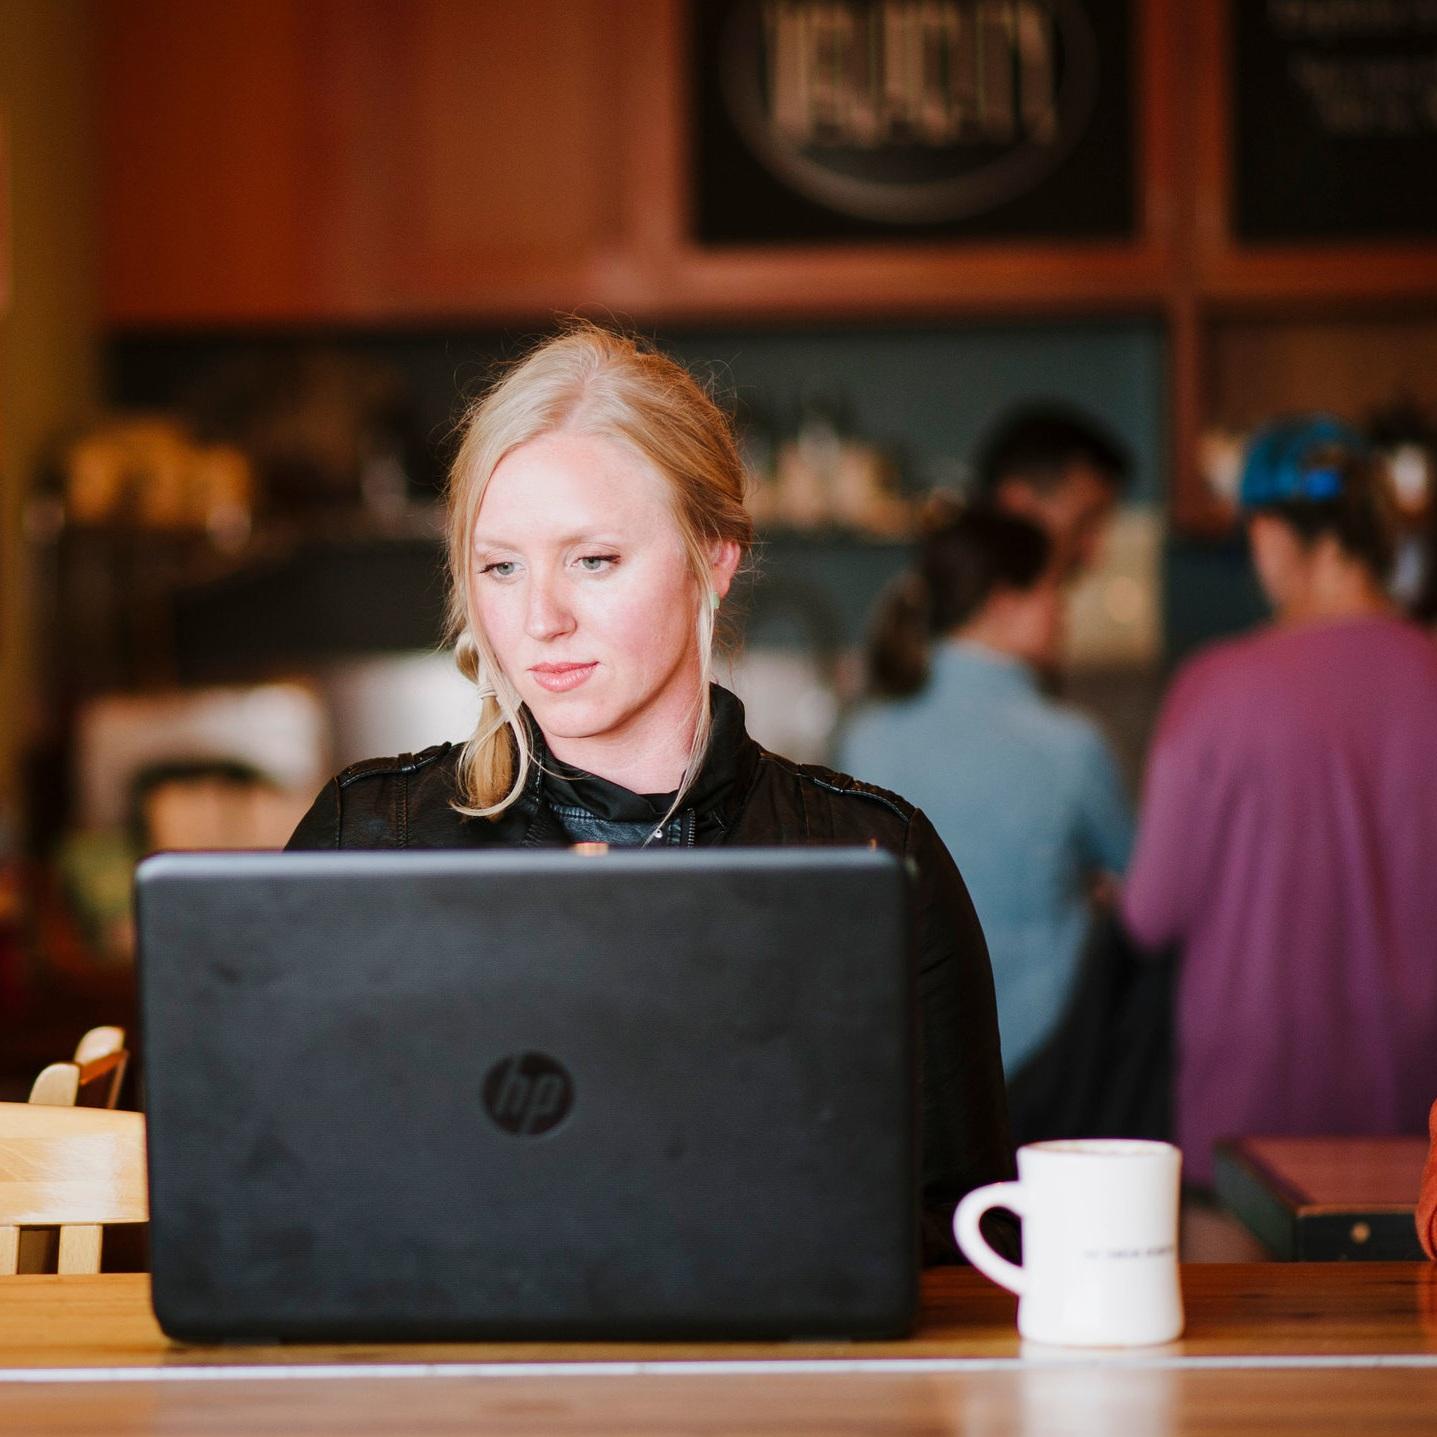 Tiffany Davidson Squarespace Designer Squarespace Web Designer Squarespace SEO Expert